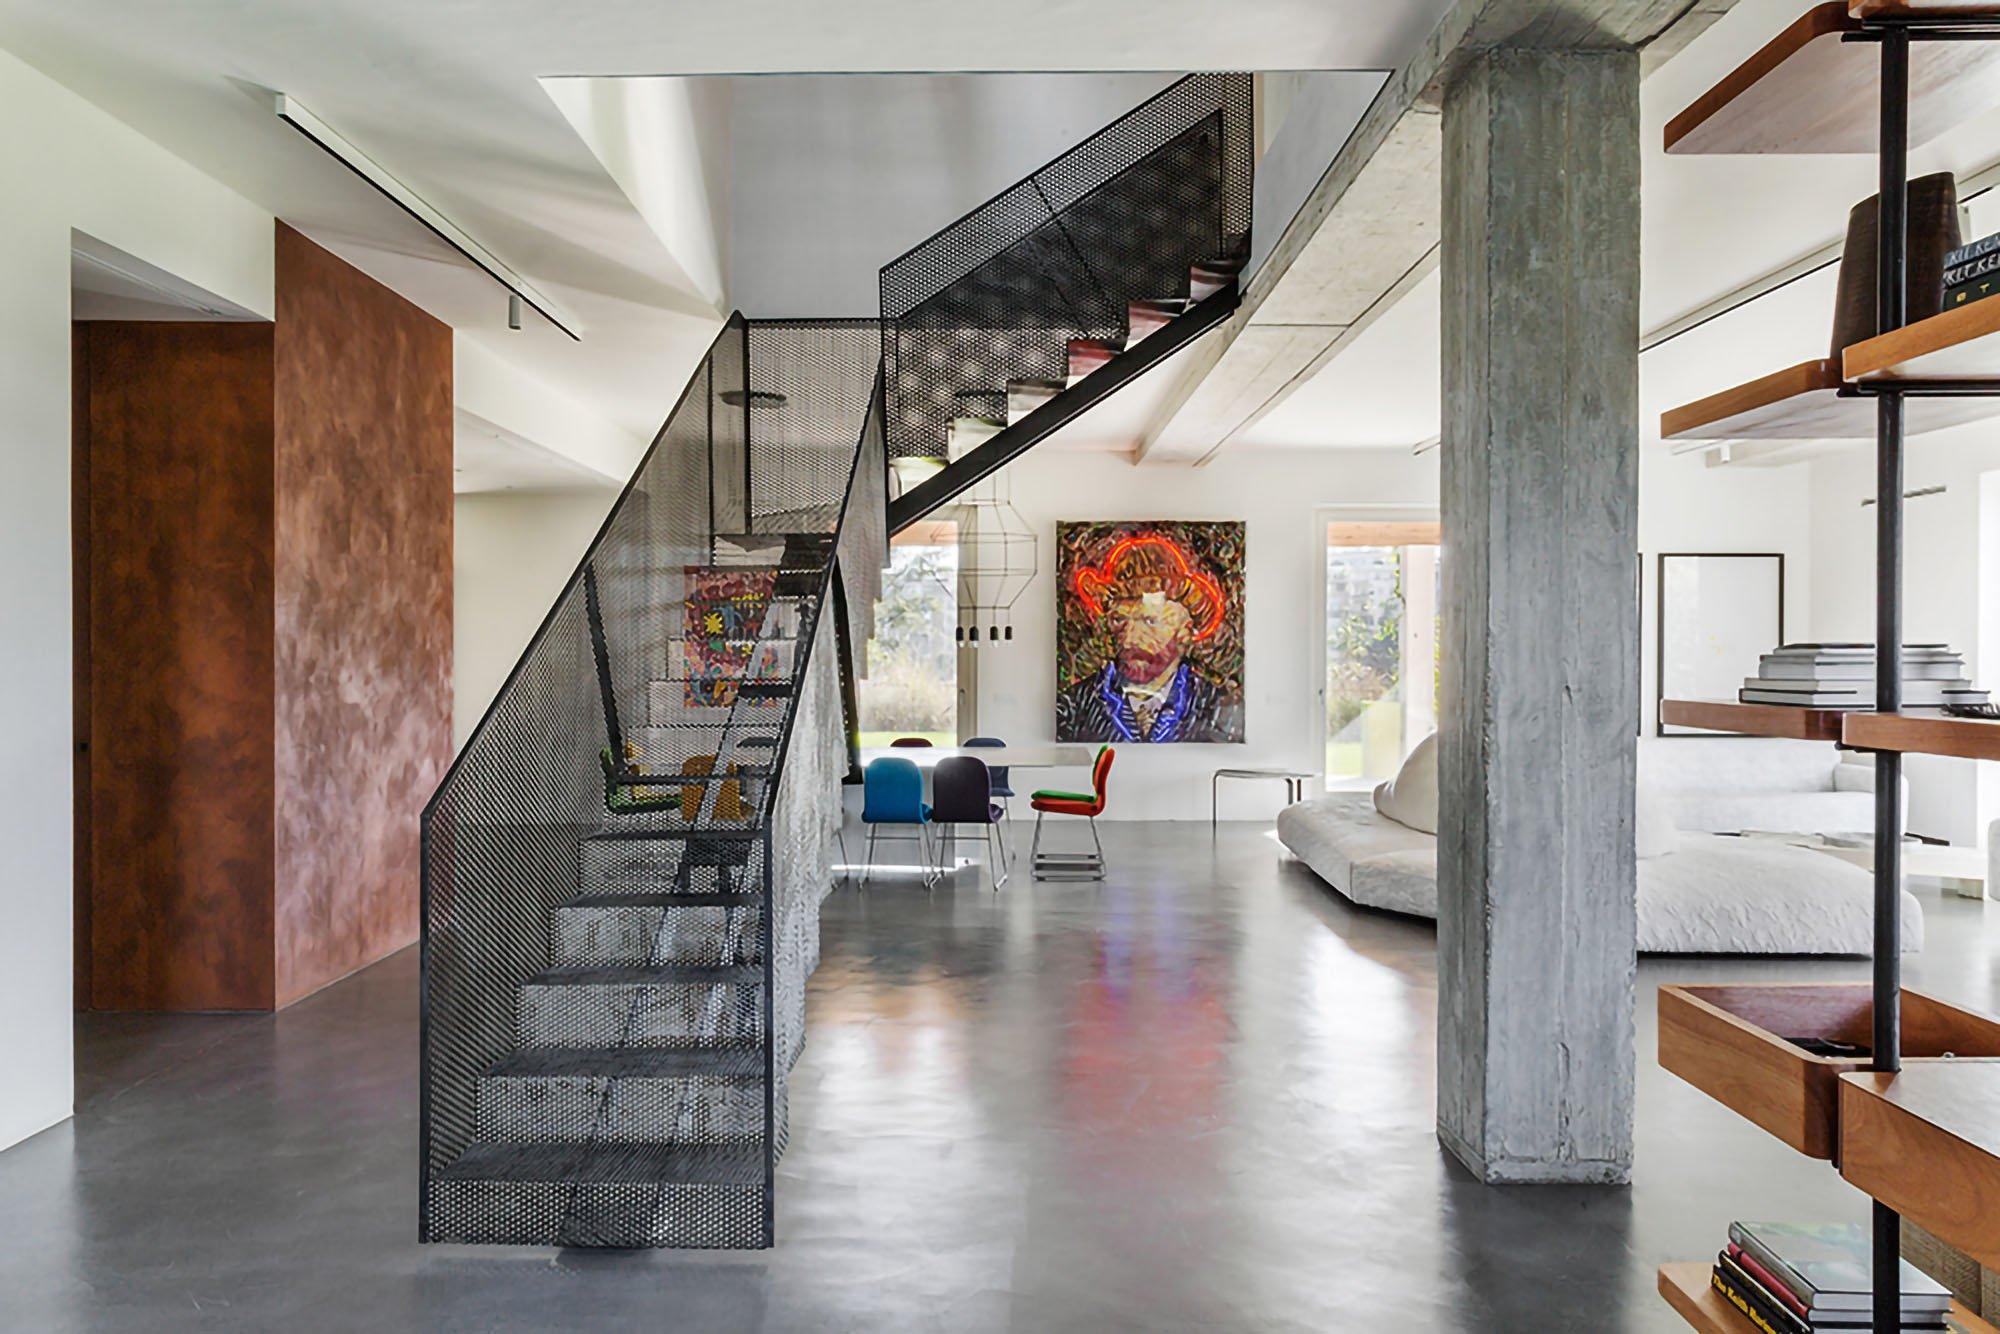 Casa C: a farmhouse transformed into a contemporary studio